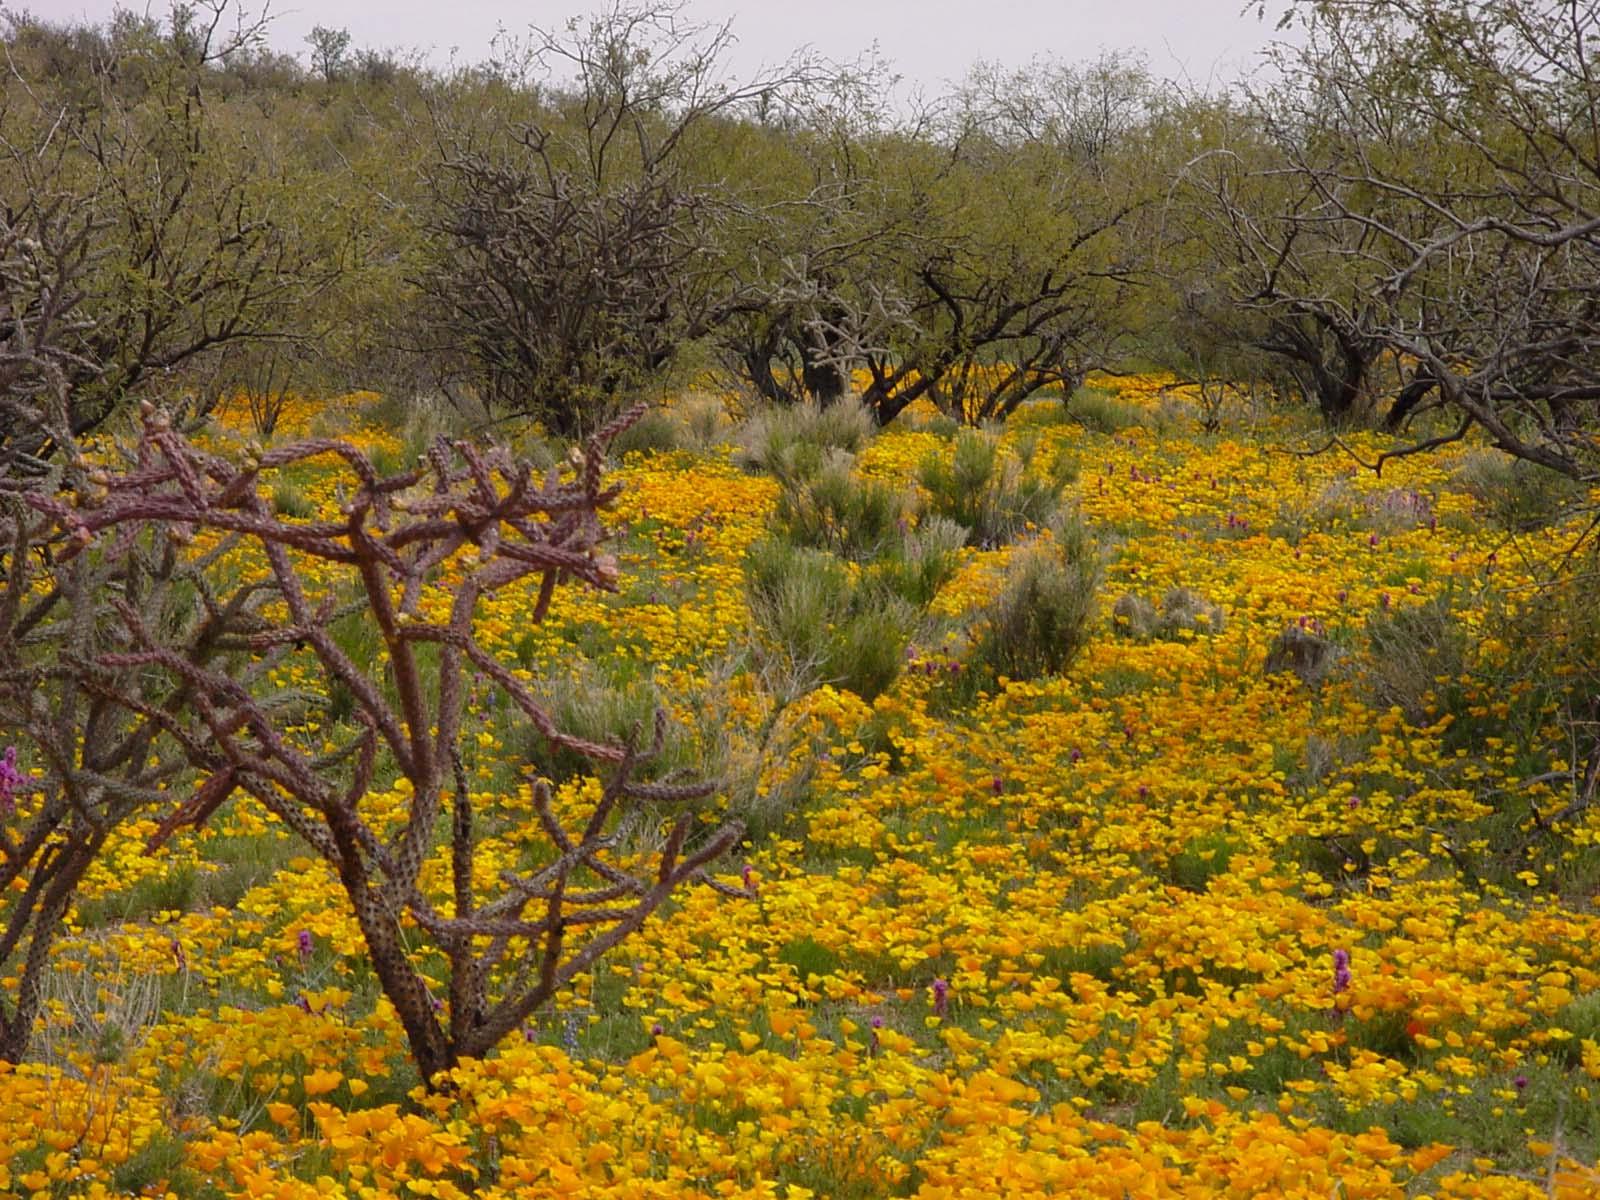 Фото Мексики весной